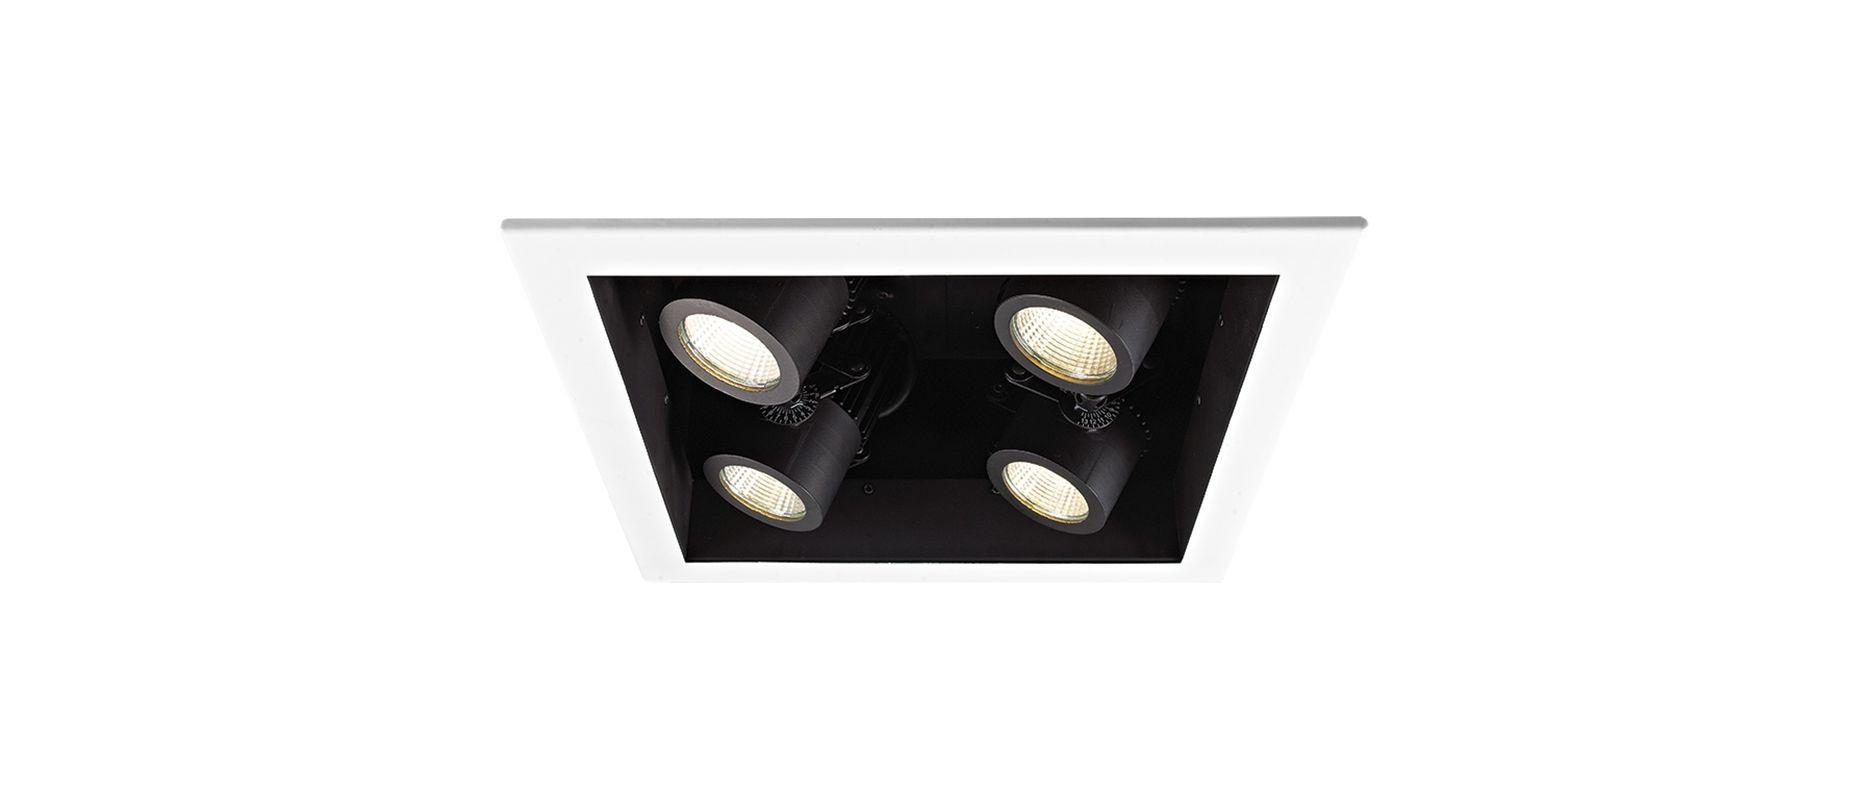 WAC Lighting MT-4LD226N-F927 4 Light Energy Star 2700K High Output LED